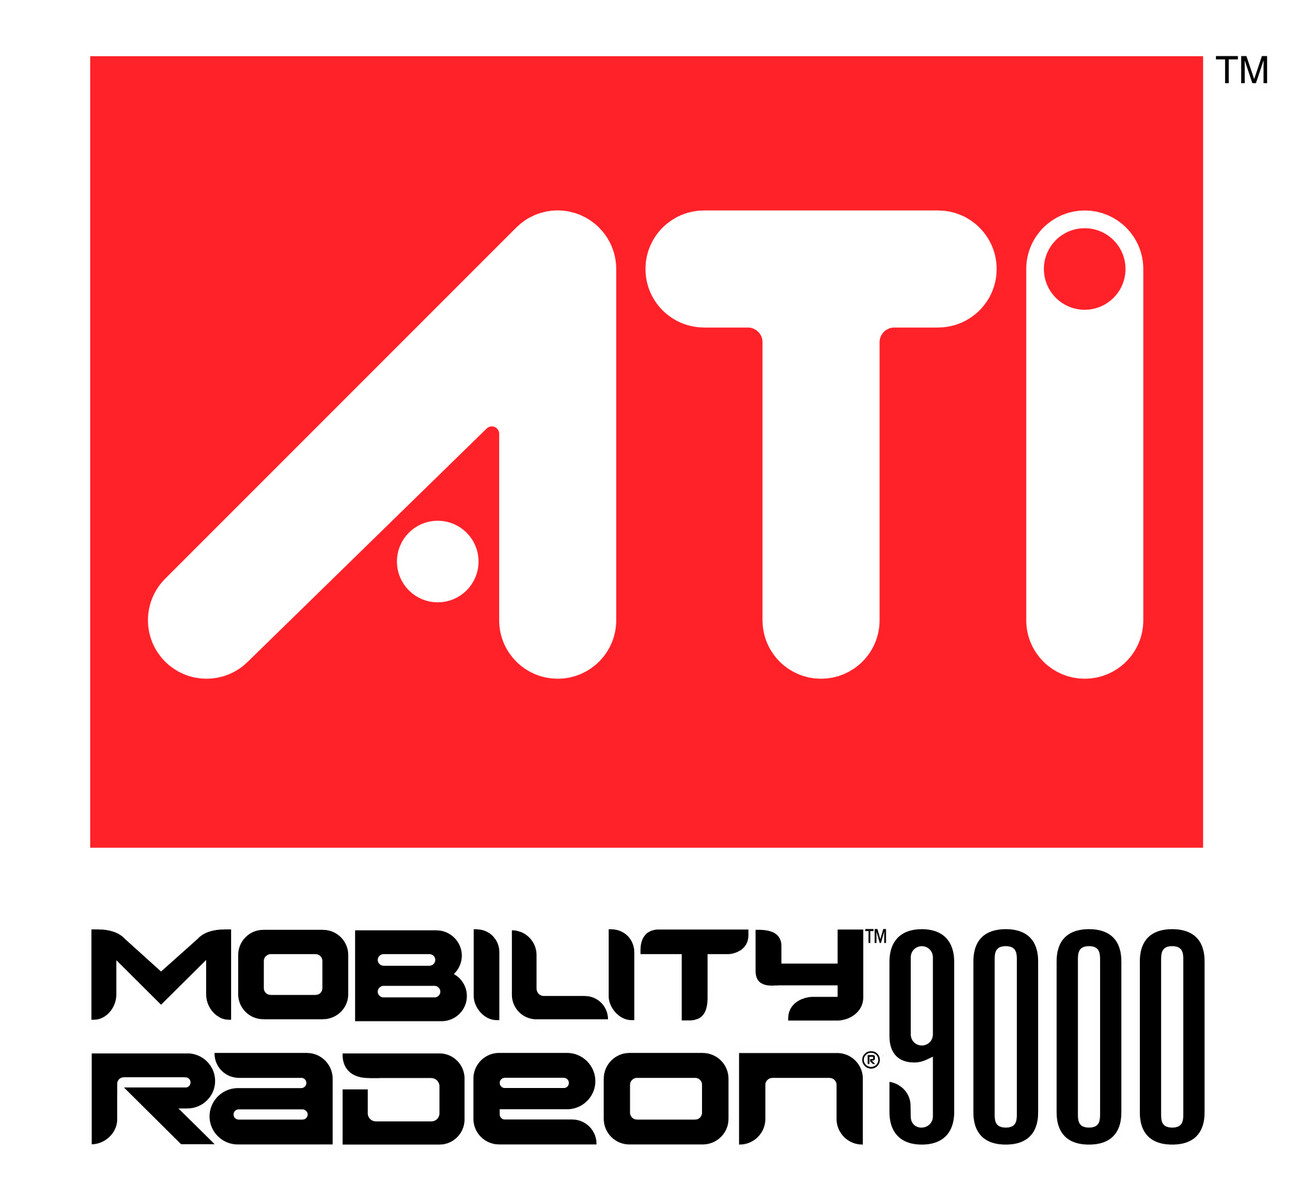 ATI MOBILITY RADEON IGP-340M DRIVERS FOR WINDOWS